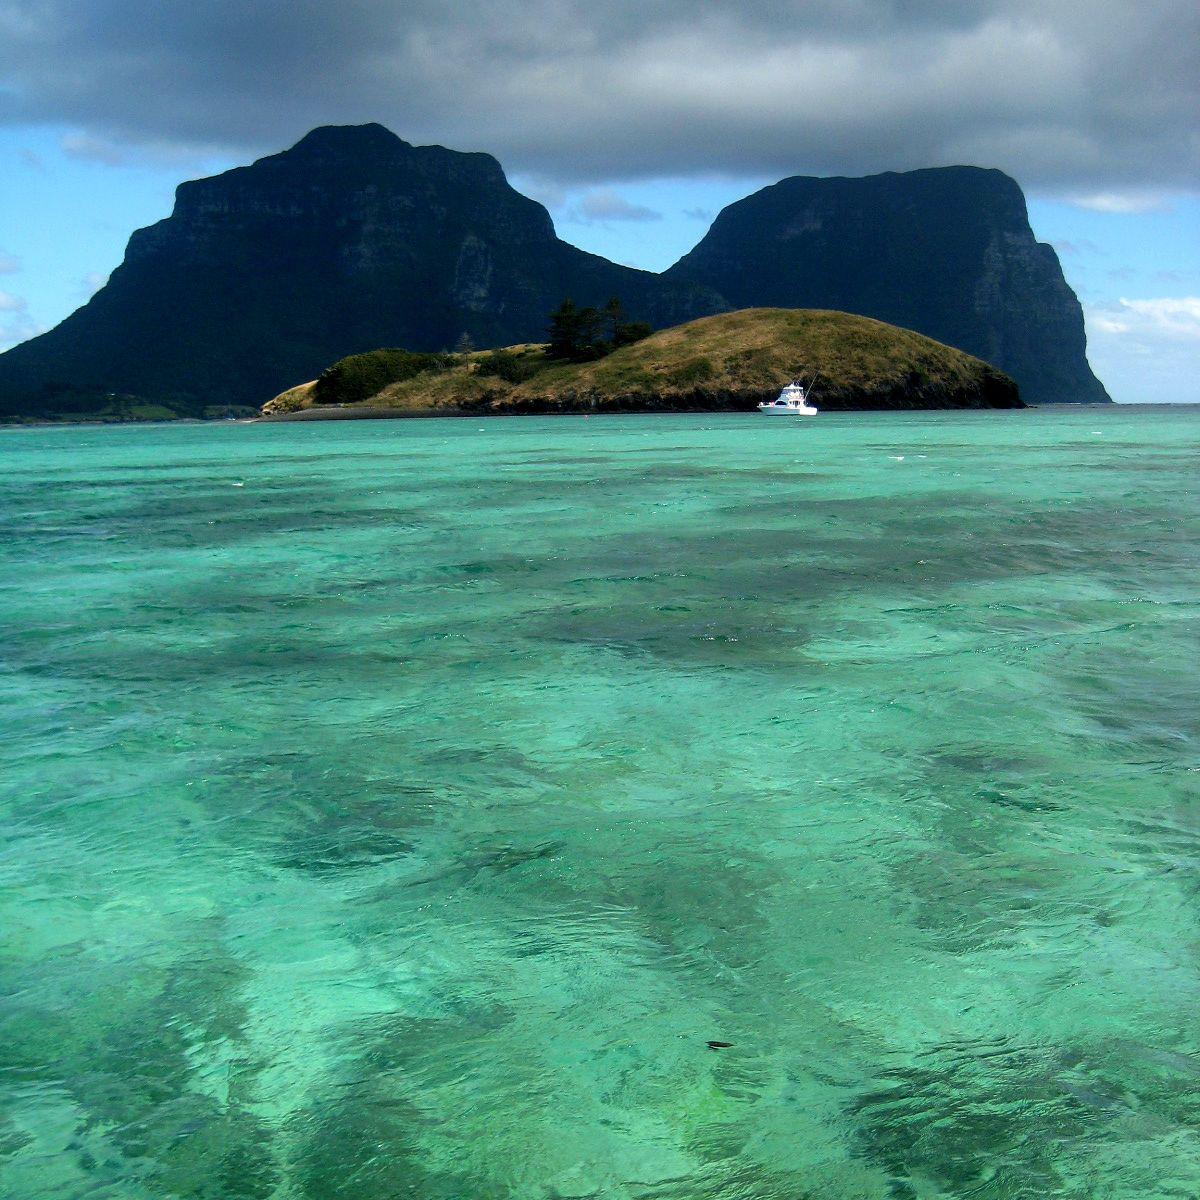 Остров Лорд Хау VK9DLX VK9LM